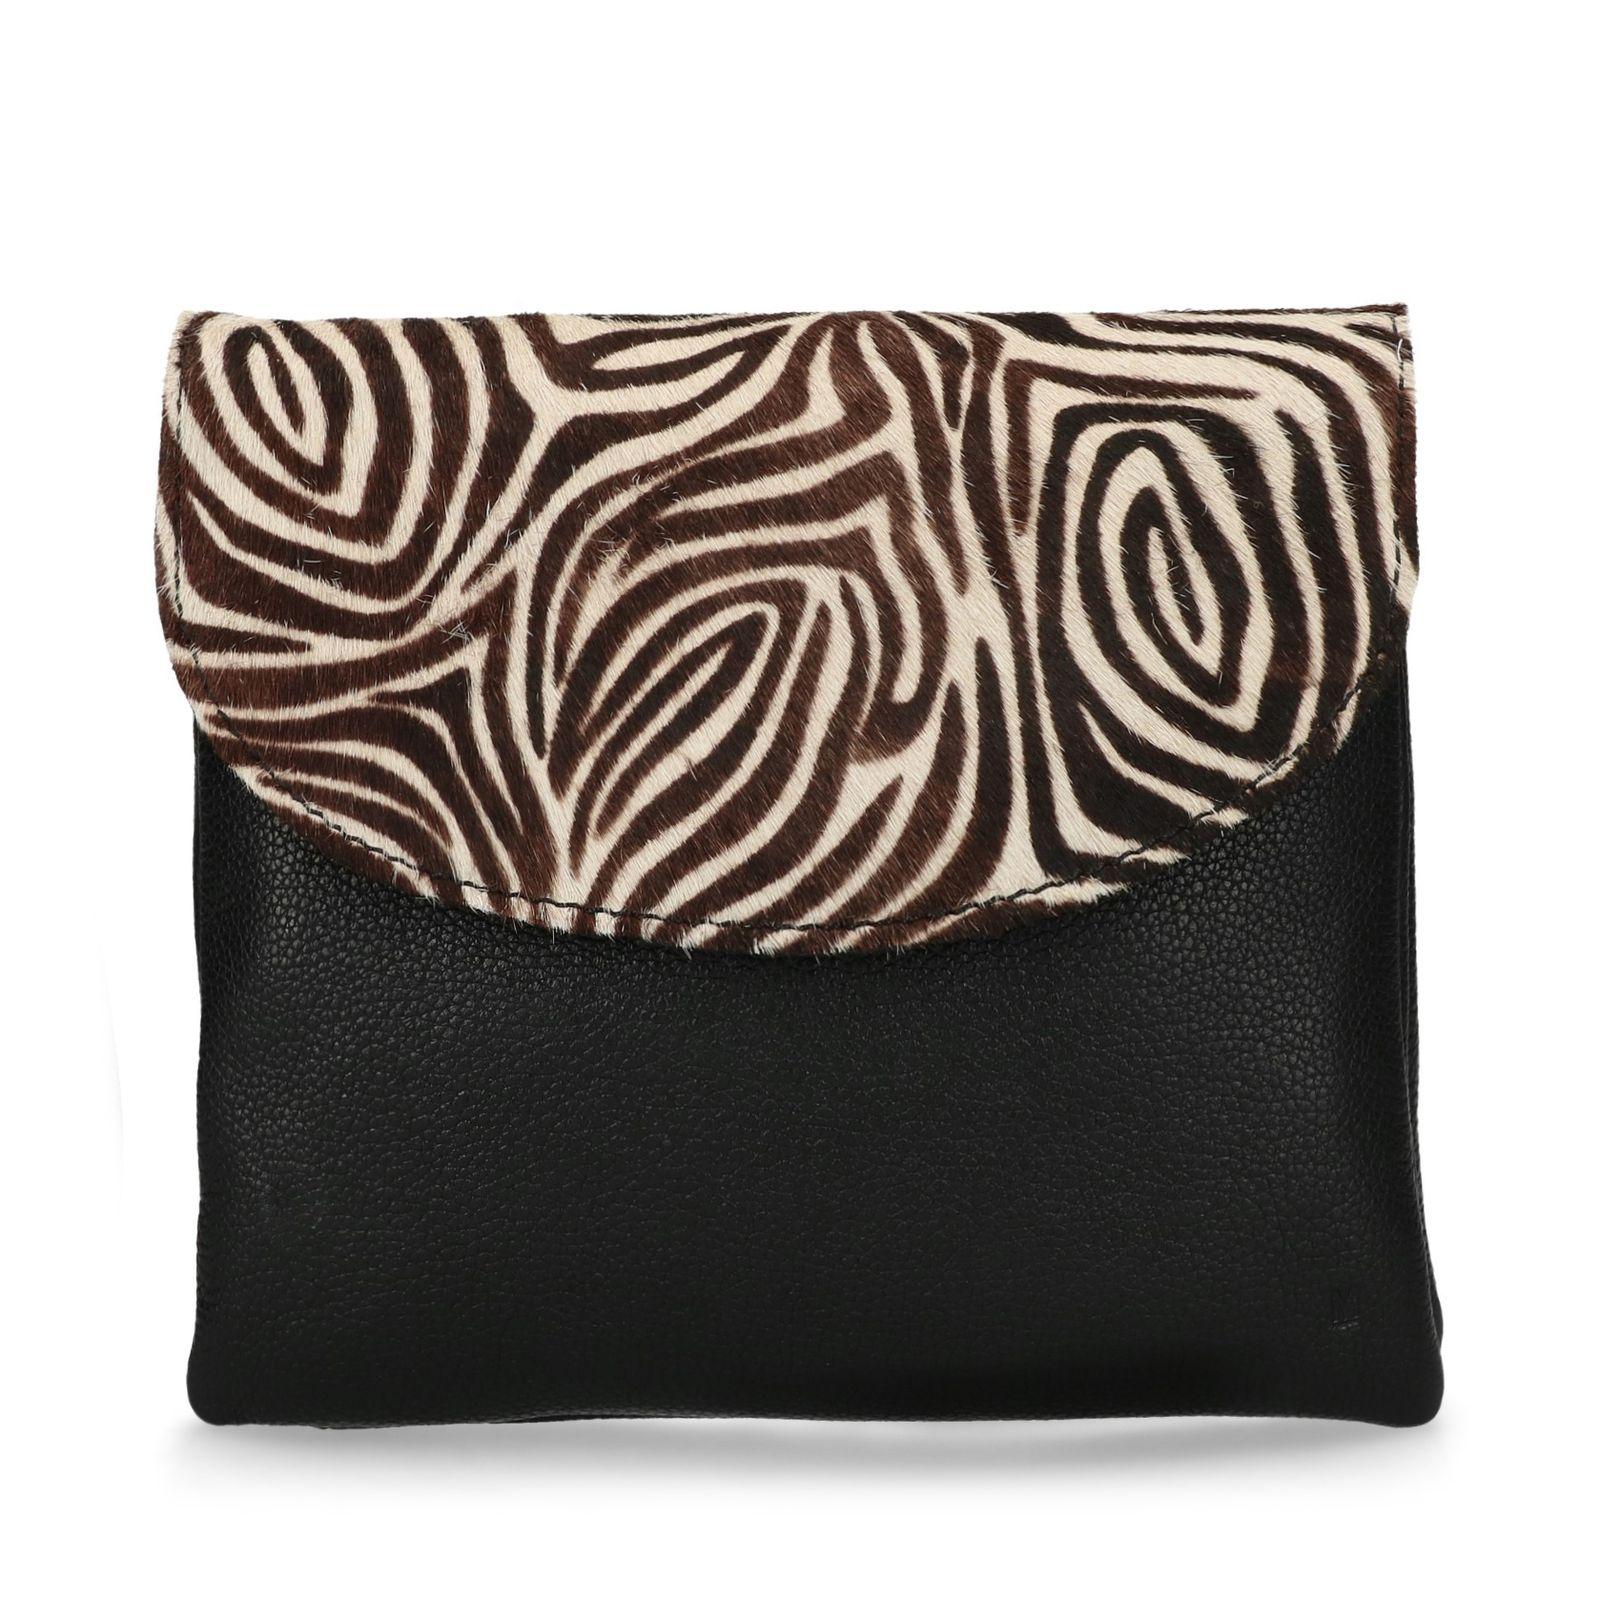 d6d5d1d69c3 Zwart schoudertasje met zebra print - Tassen   MANFIELD